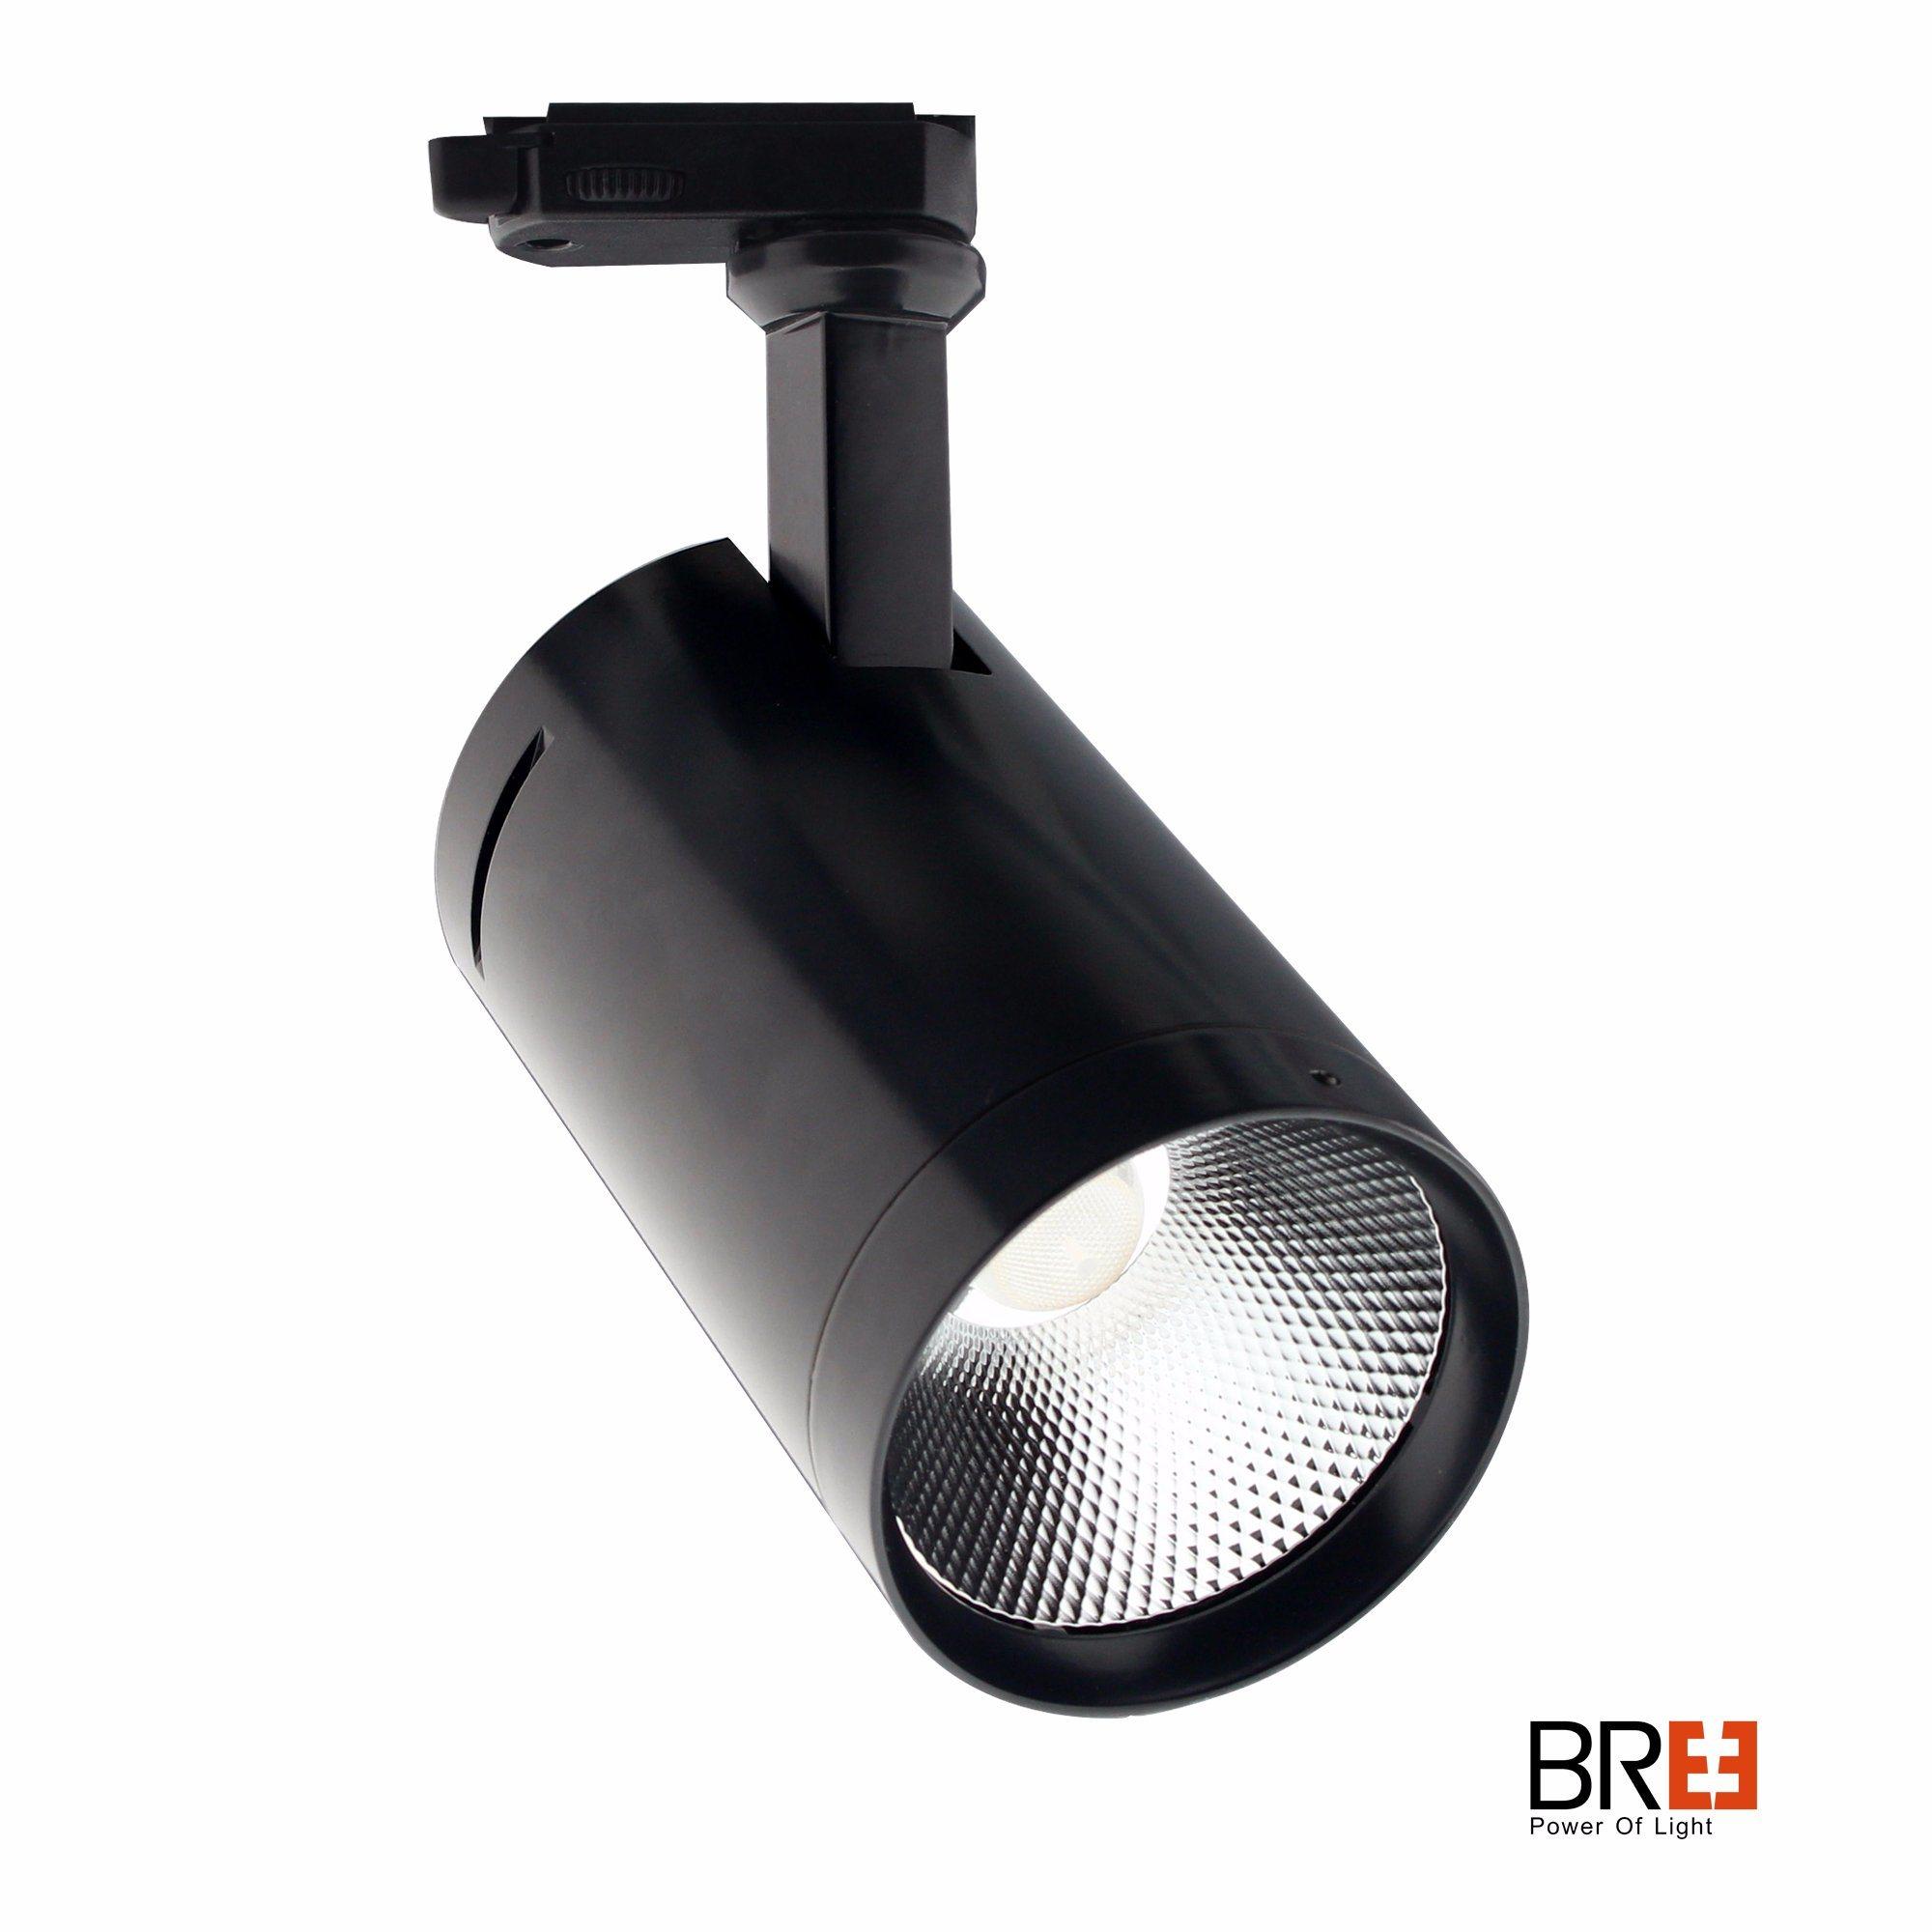 China 3 Year Warranty Lens Angle Adjustable Juno Track Lighting China Juno Track Lighting Cob Led Tracklight